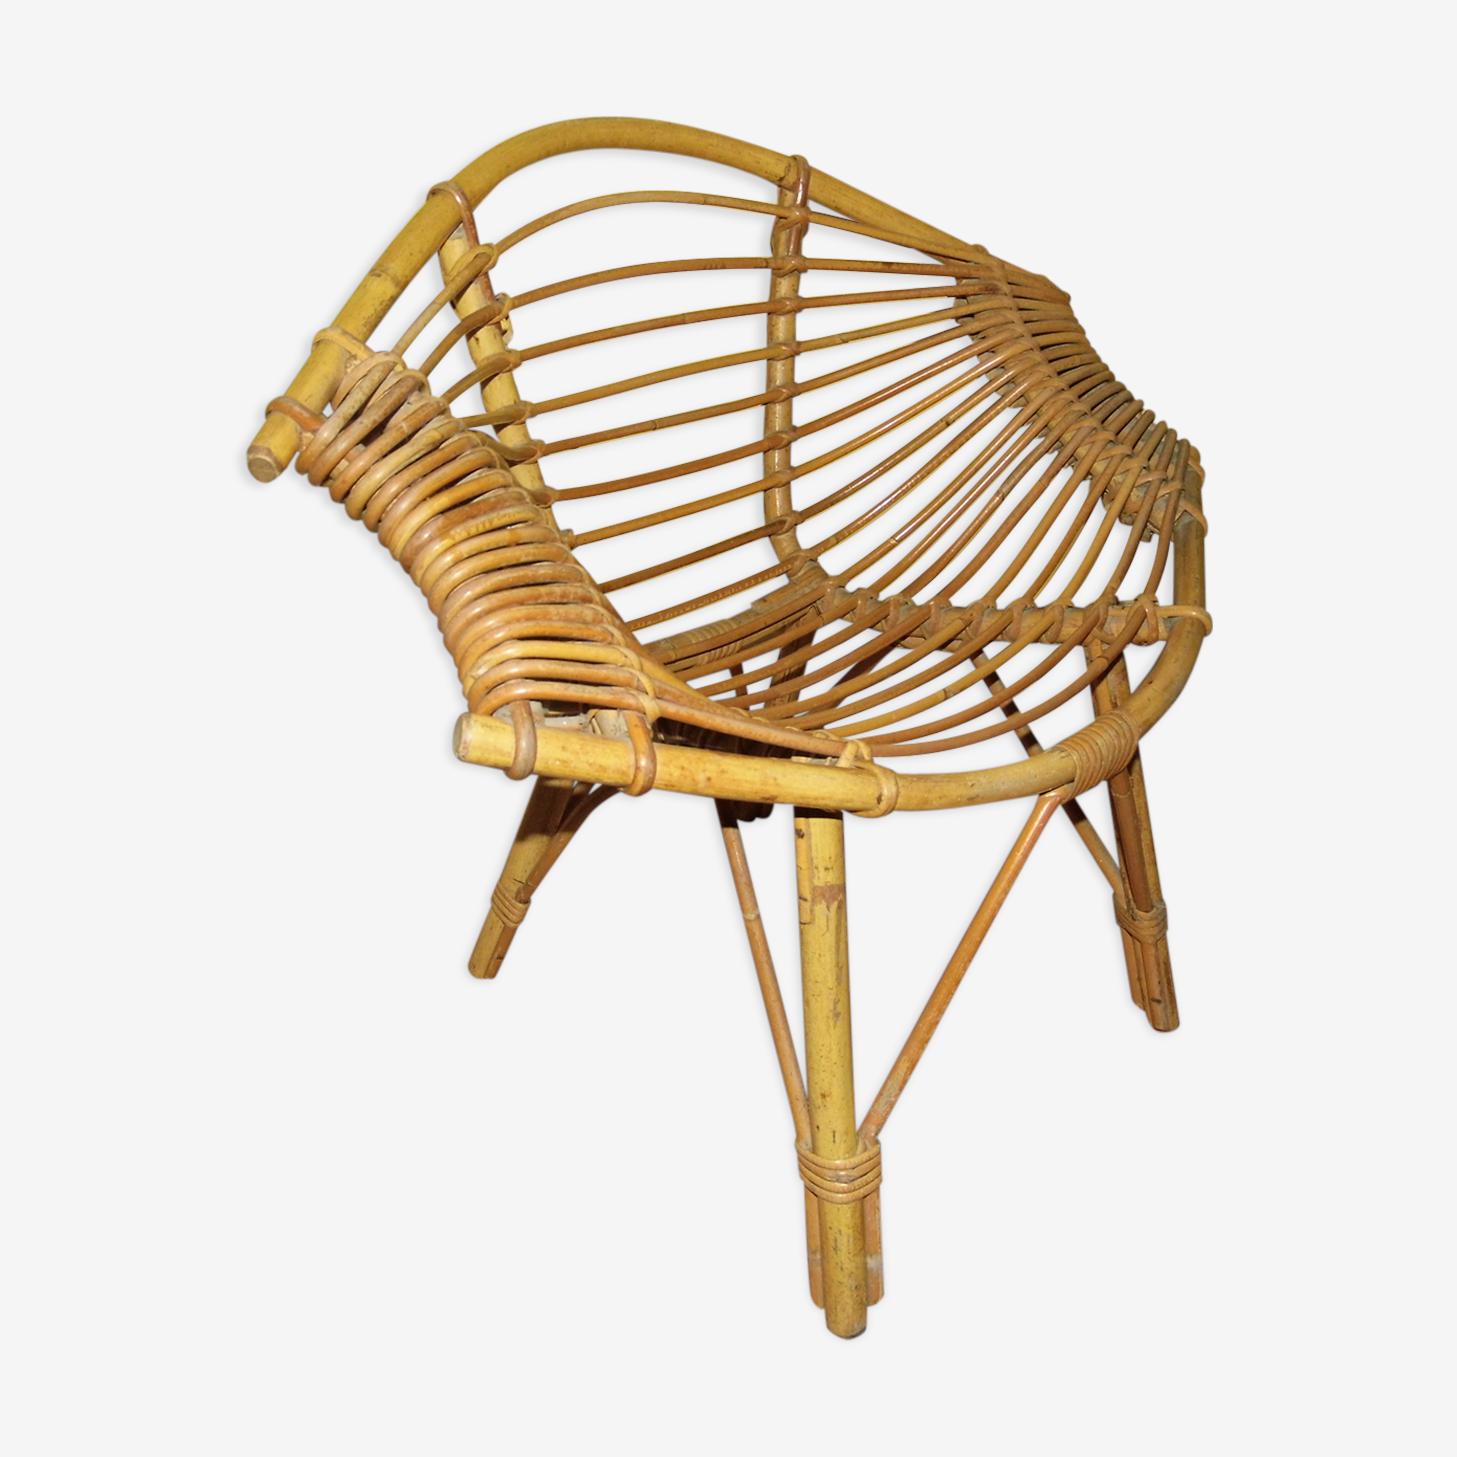 Rattan armchair vintage model lemon